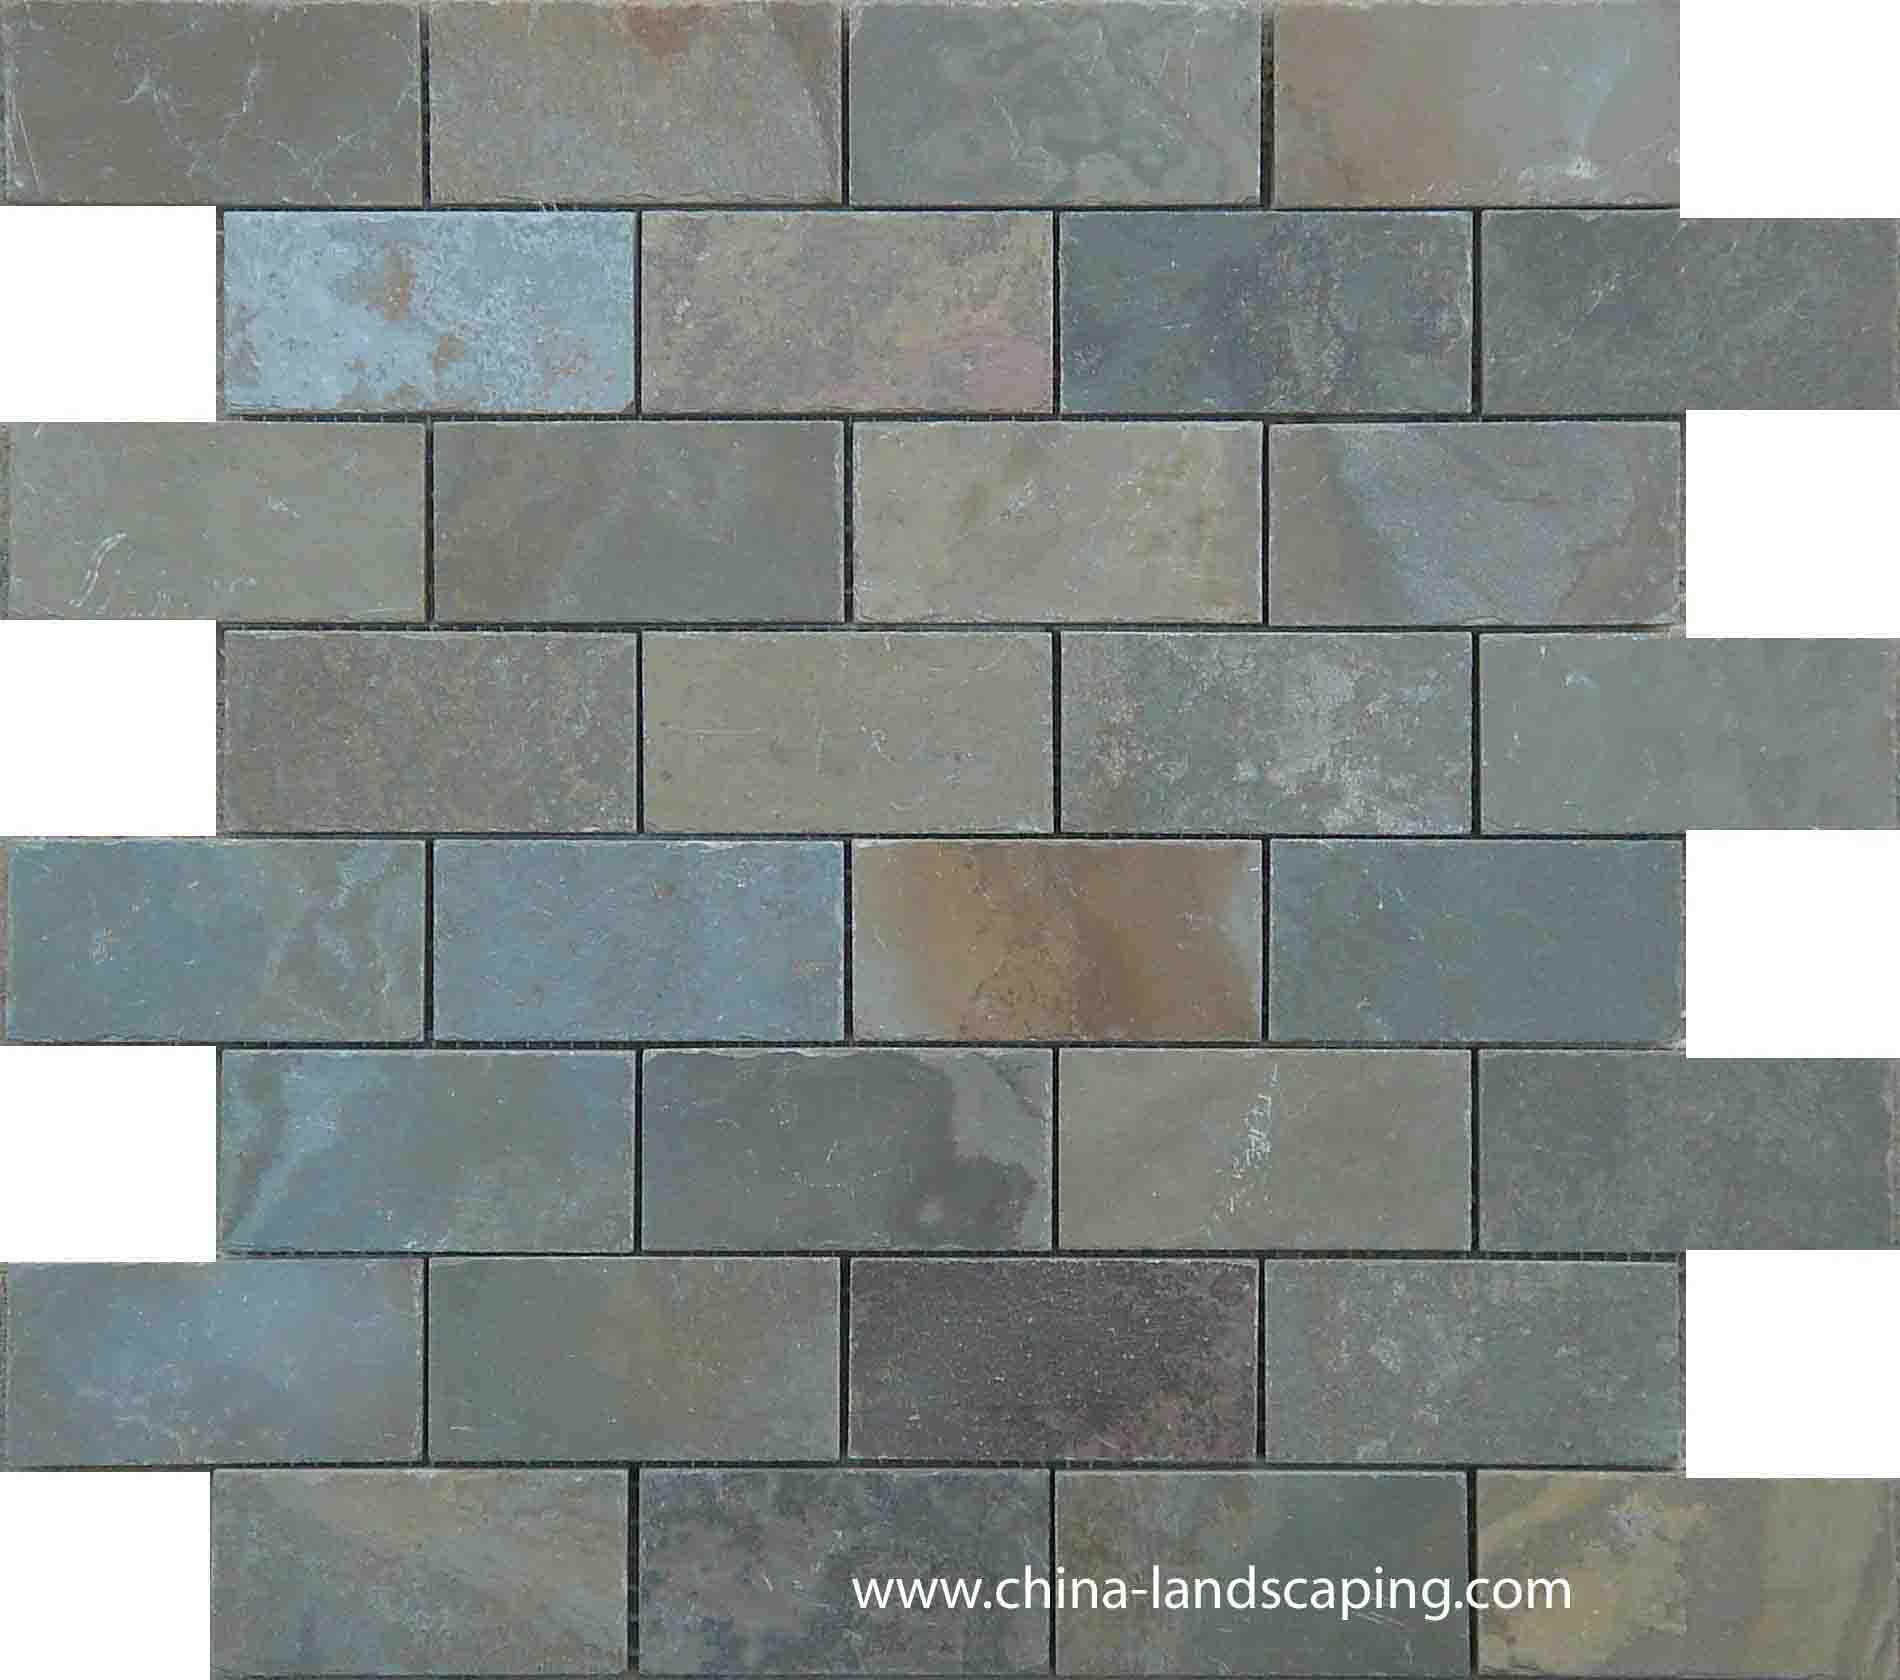 Light grey slate floor tiles choice image tile flooring design ideas blue slate floor tiles images tile flooring design ideas old morris bridge road ombr mixed use doublecrazyfo Image collections